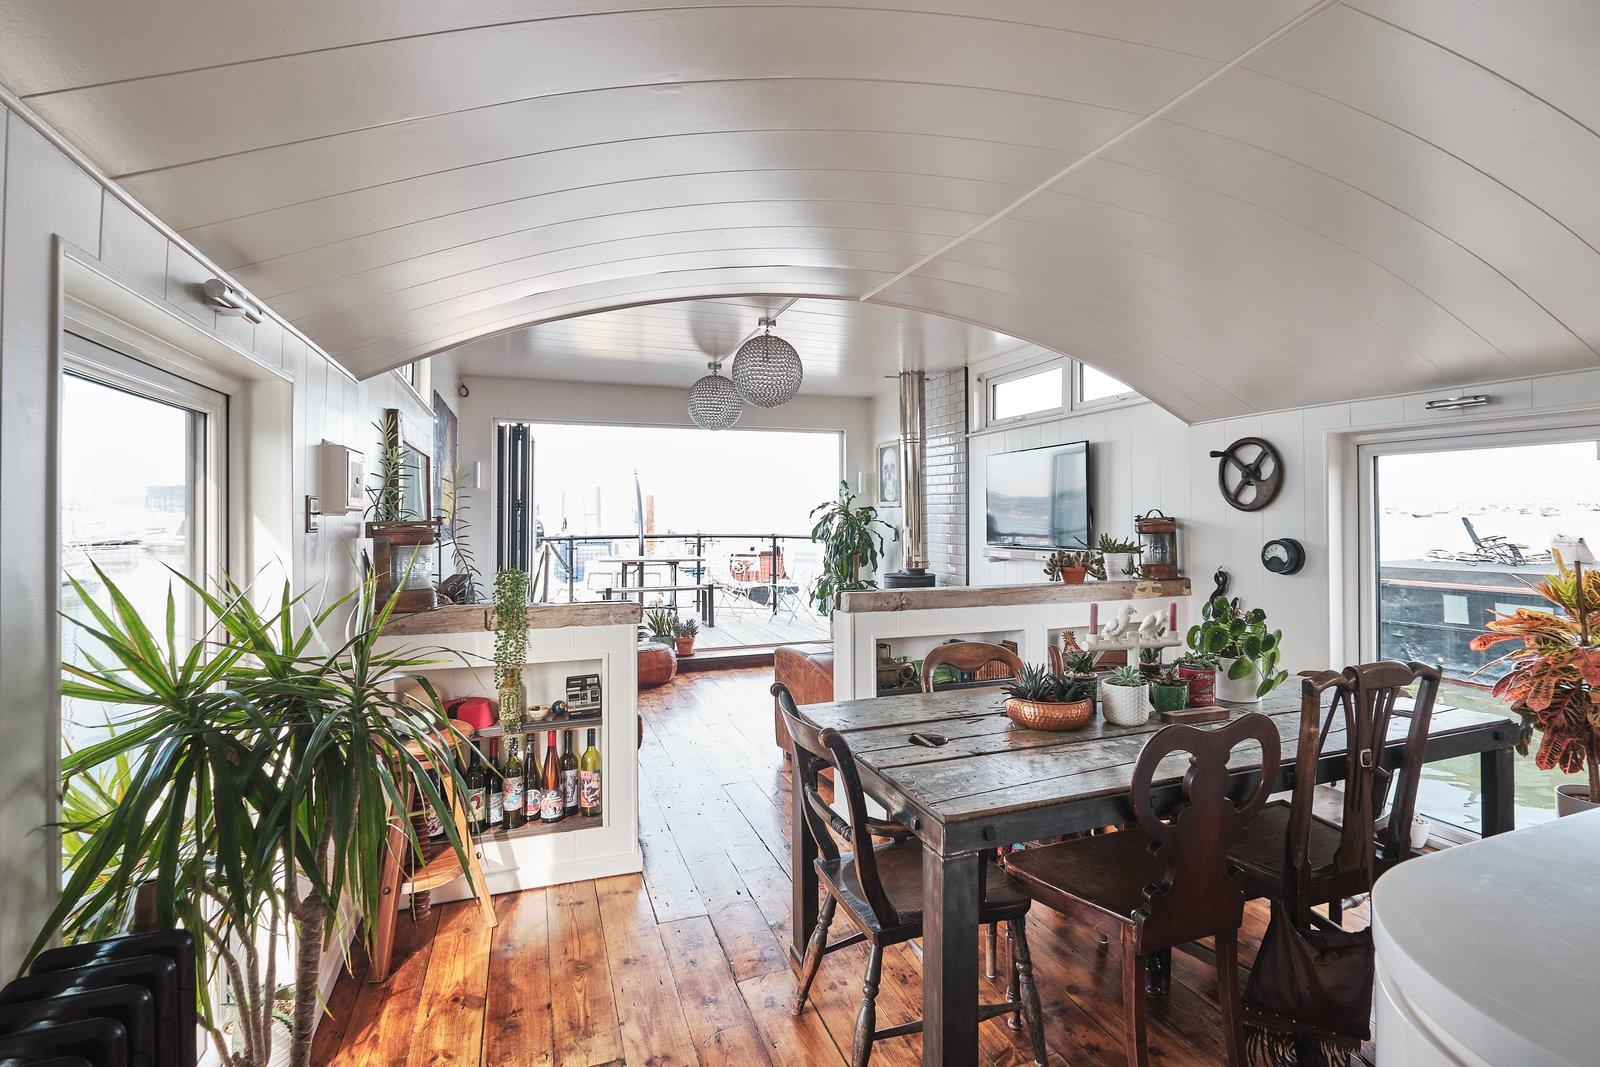 Gosport double-decker houseboat living room